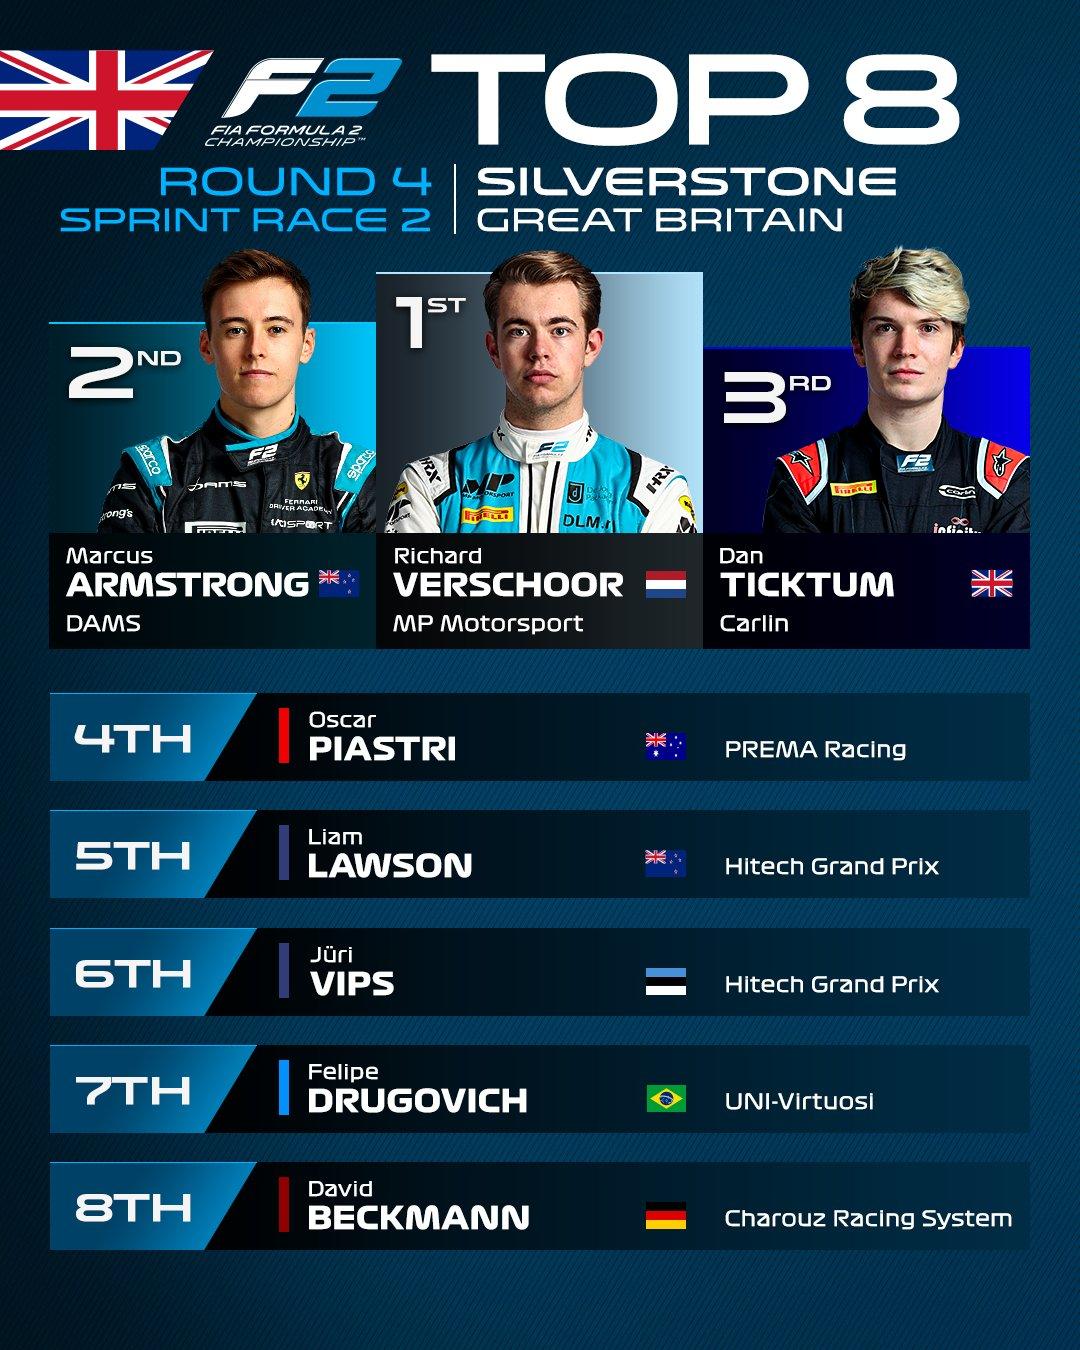 Sprint race 2 Silverstone